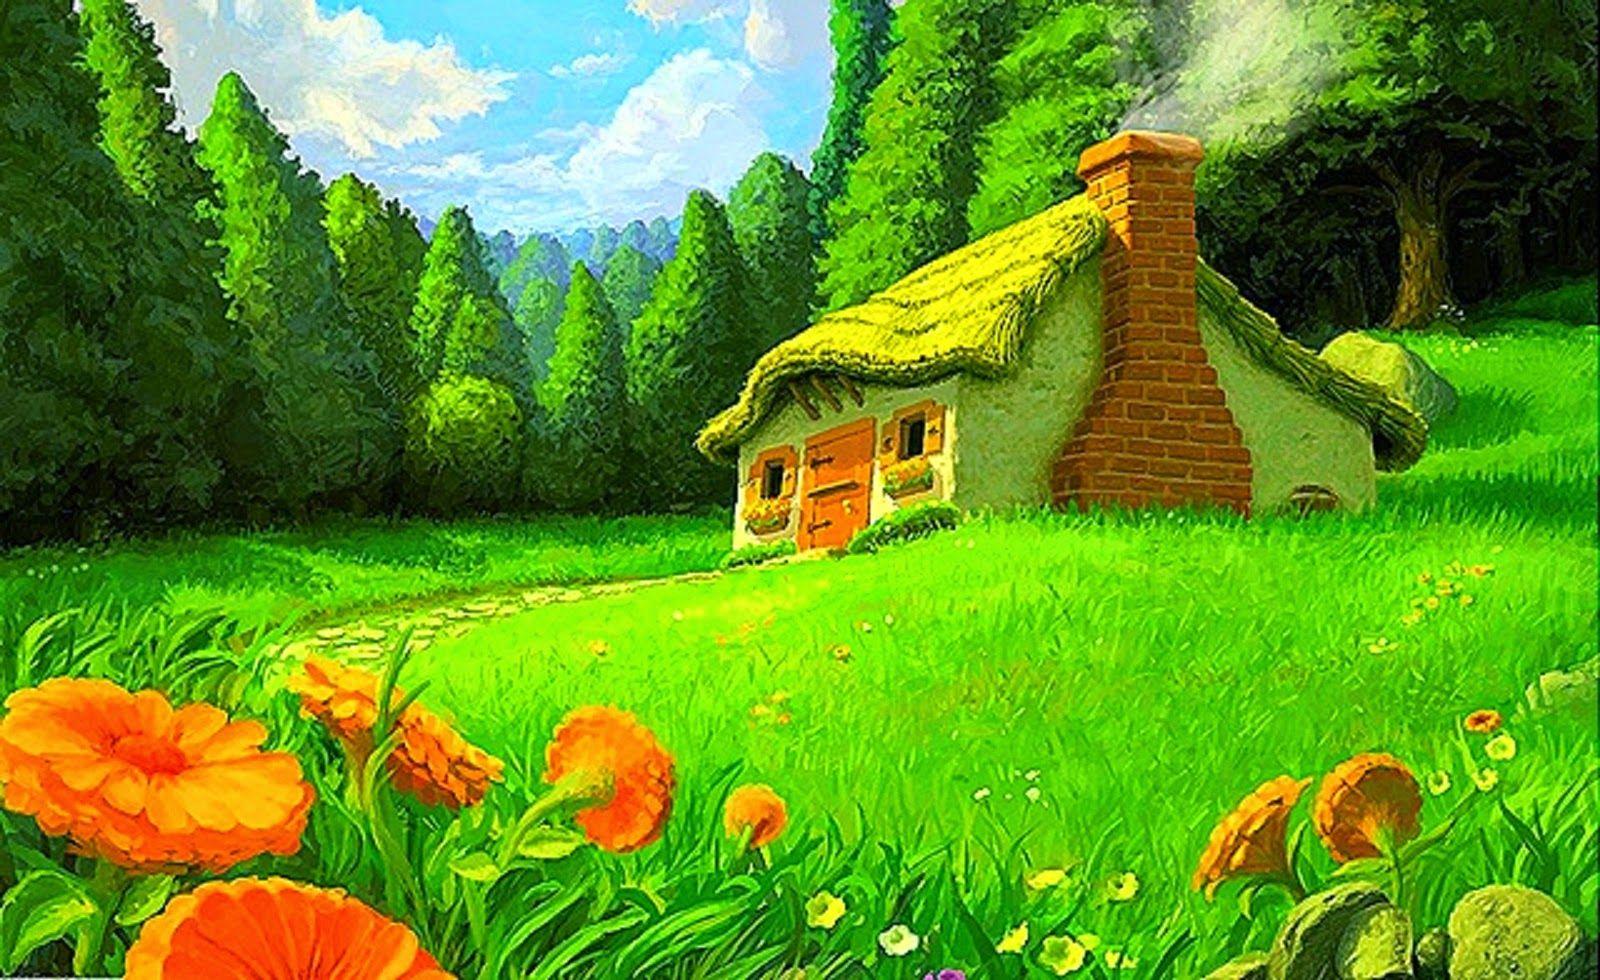 Beautiful Windows 7 Background Hd Wallpaper Free Scenery Wallpaper Beautiful Nature Wallpaper Landscape Wallpaper